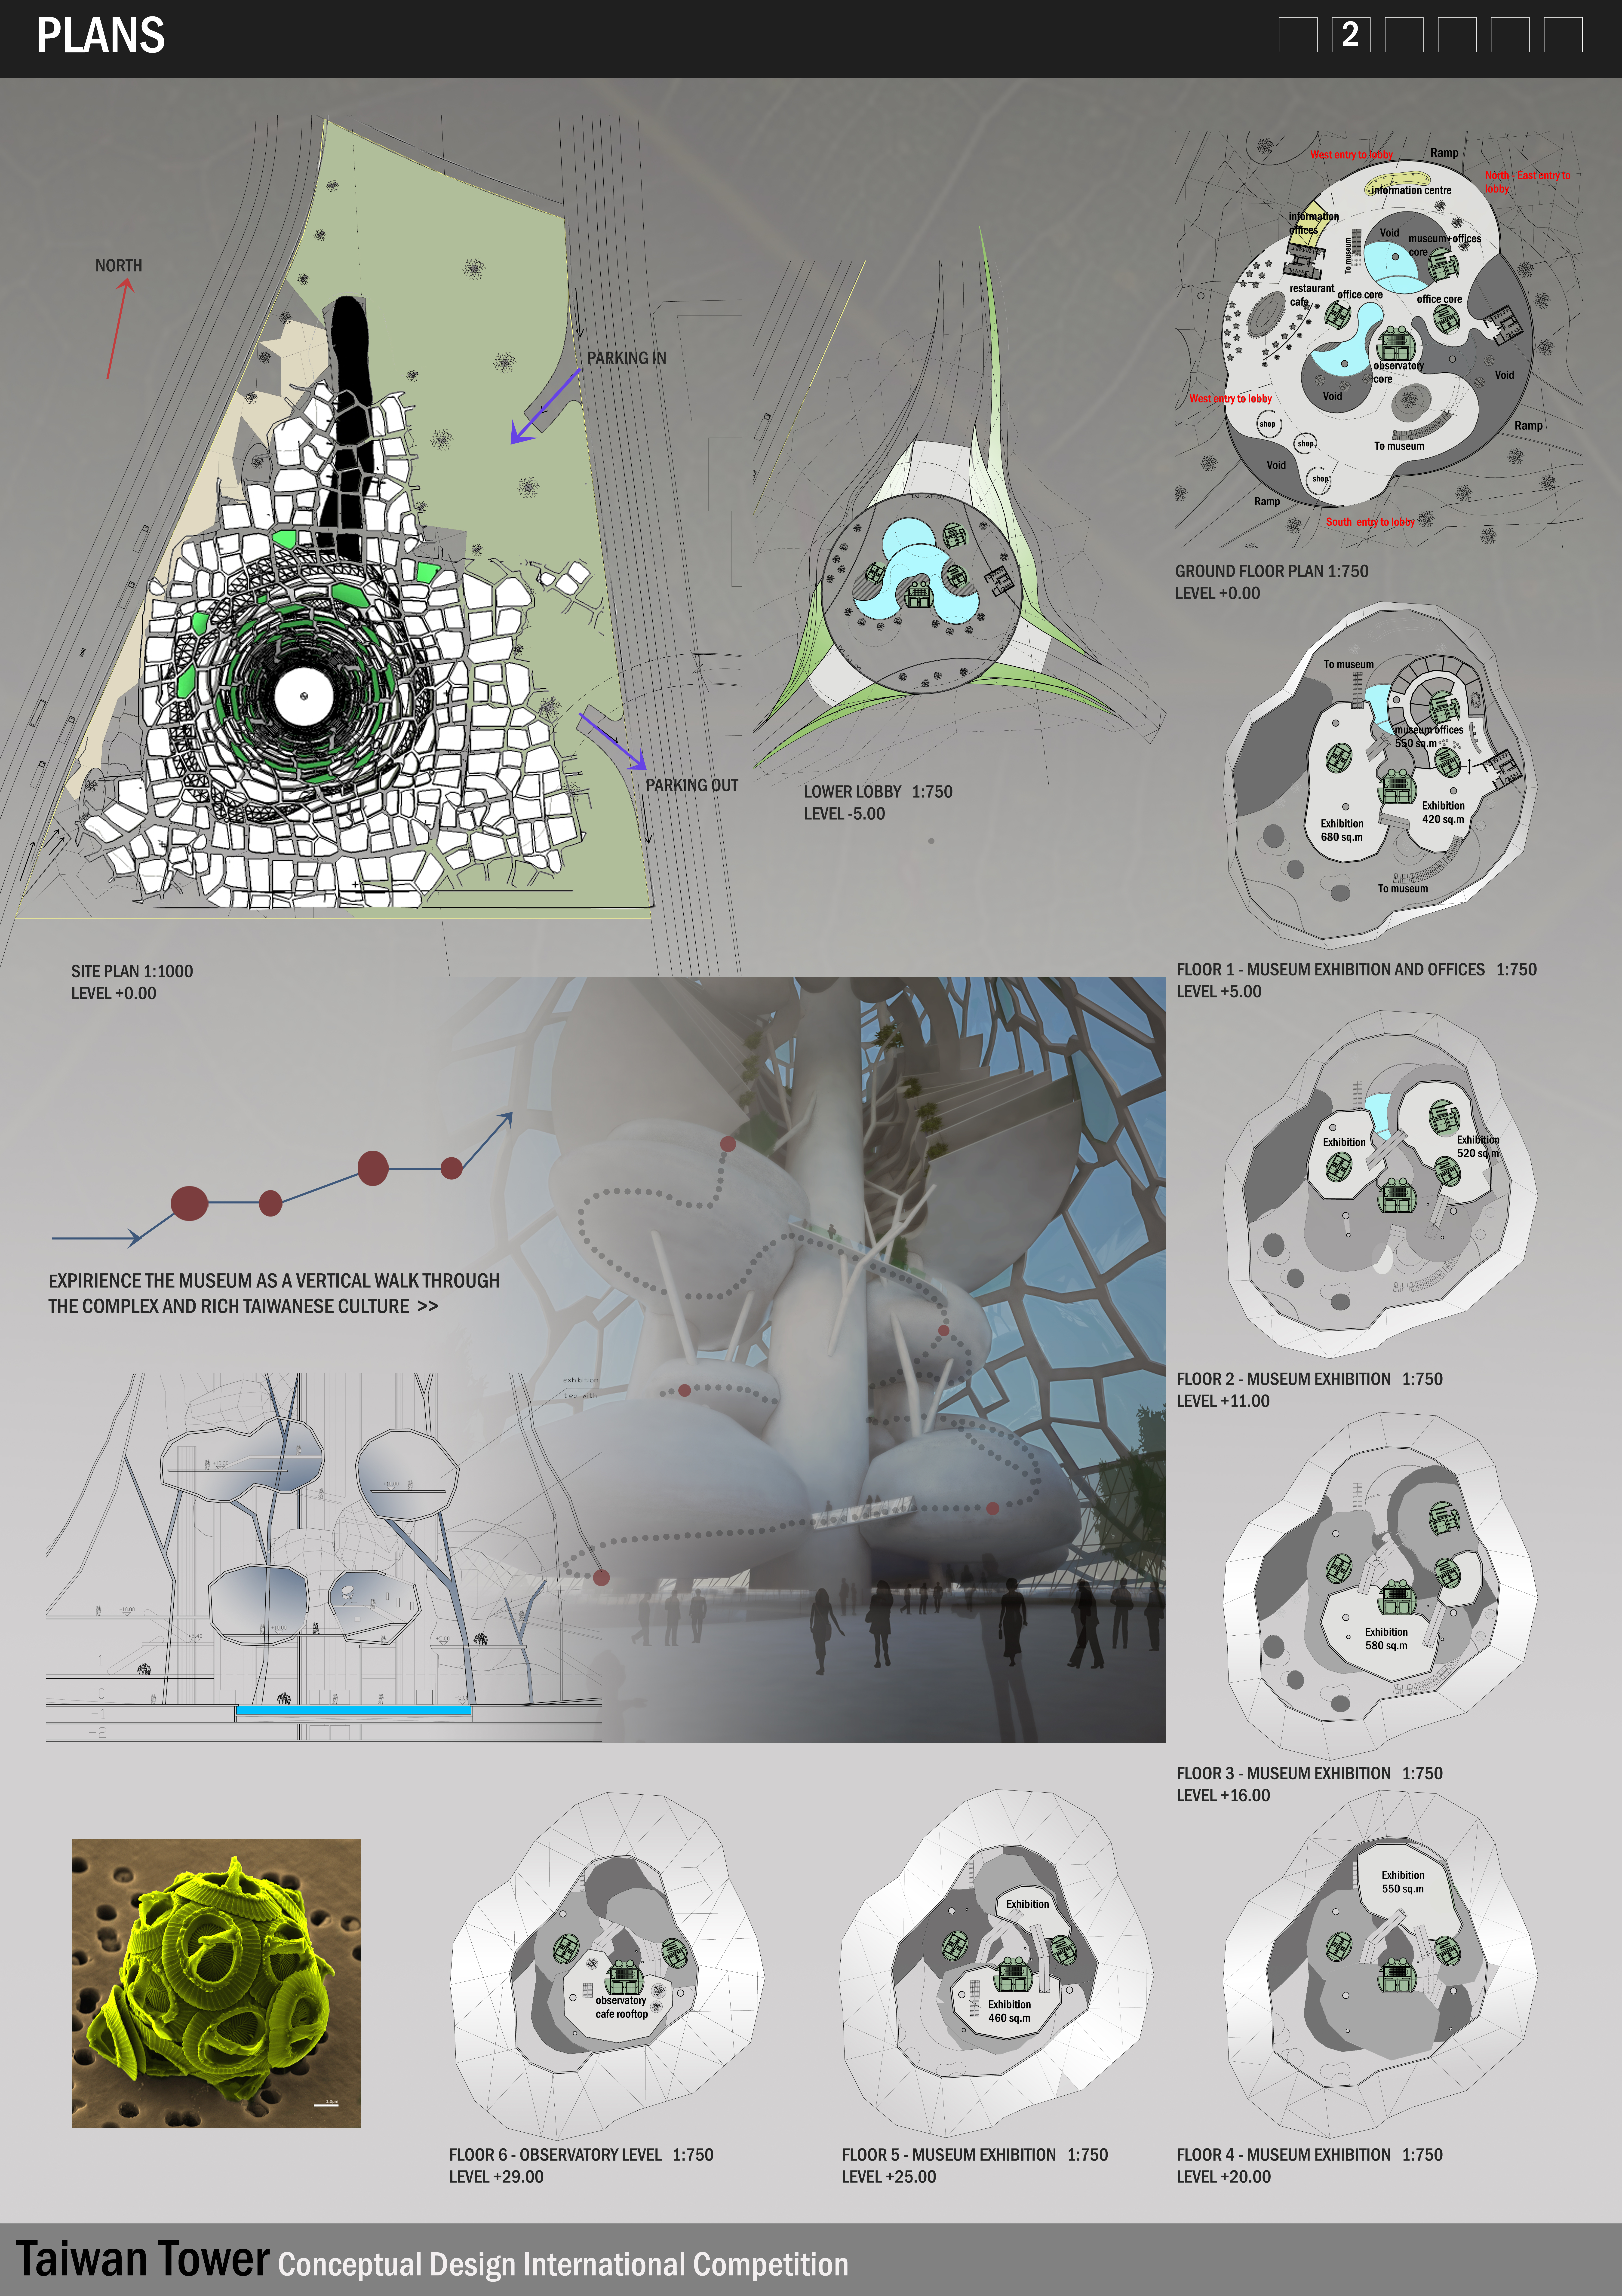 panel plans